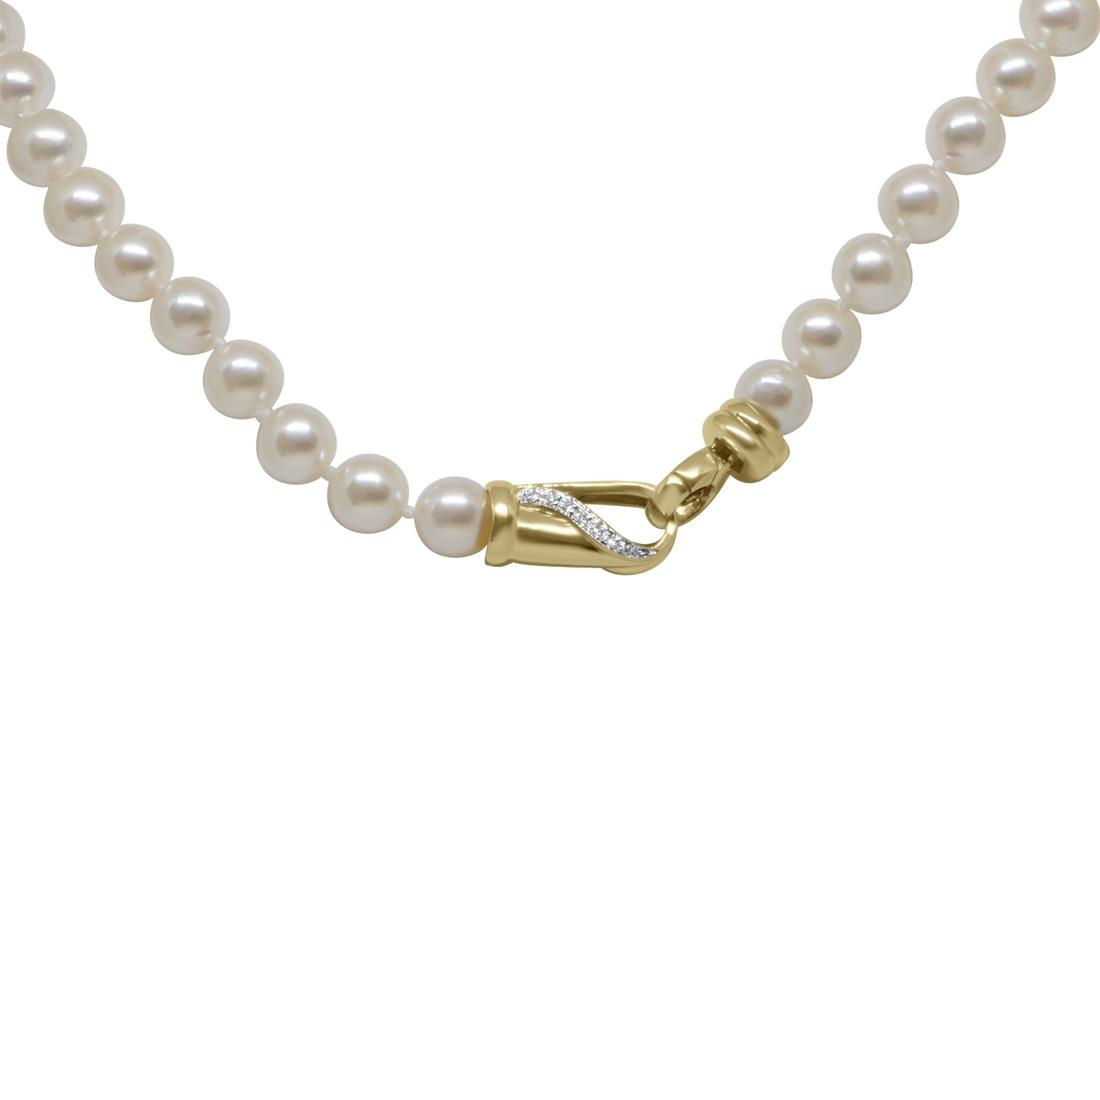 Collana Oro & Co con perle Akoya Giapponesi 8-8.5 mm - ORO&CO